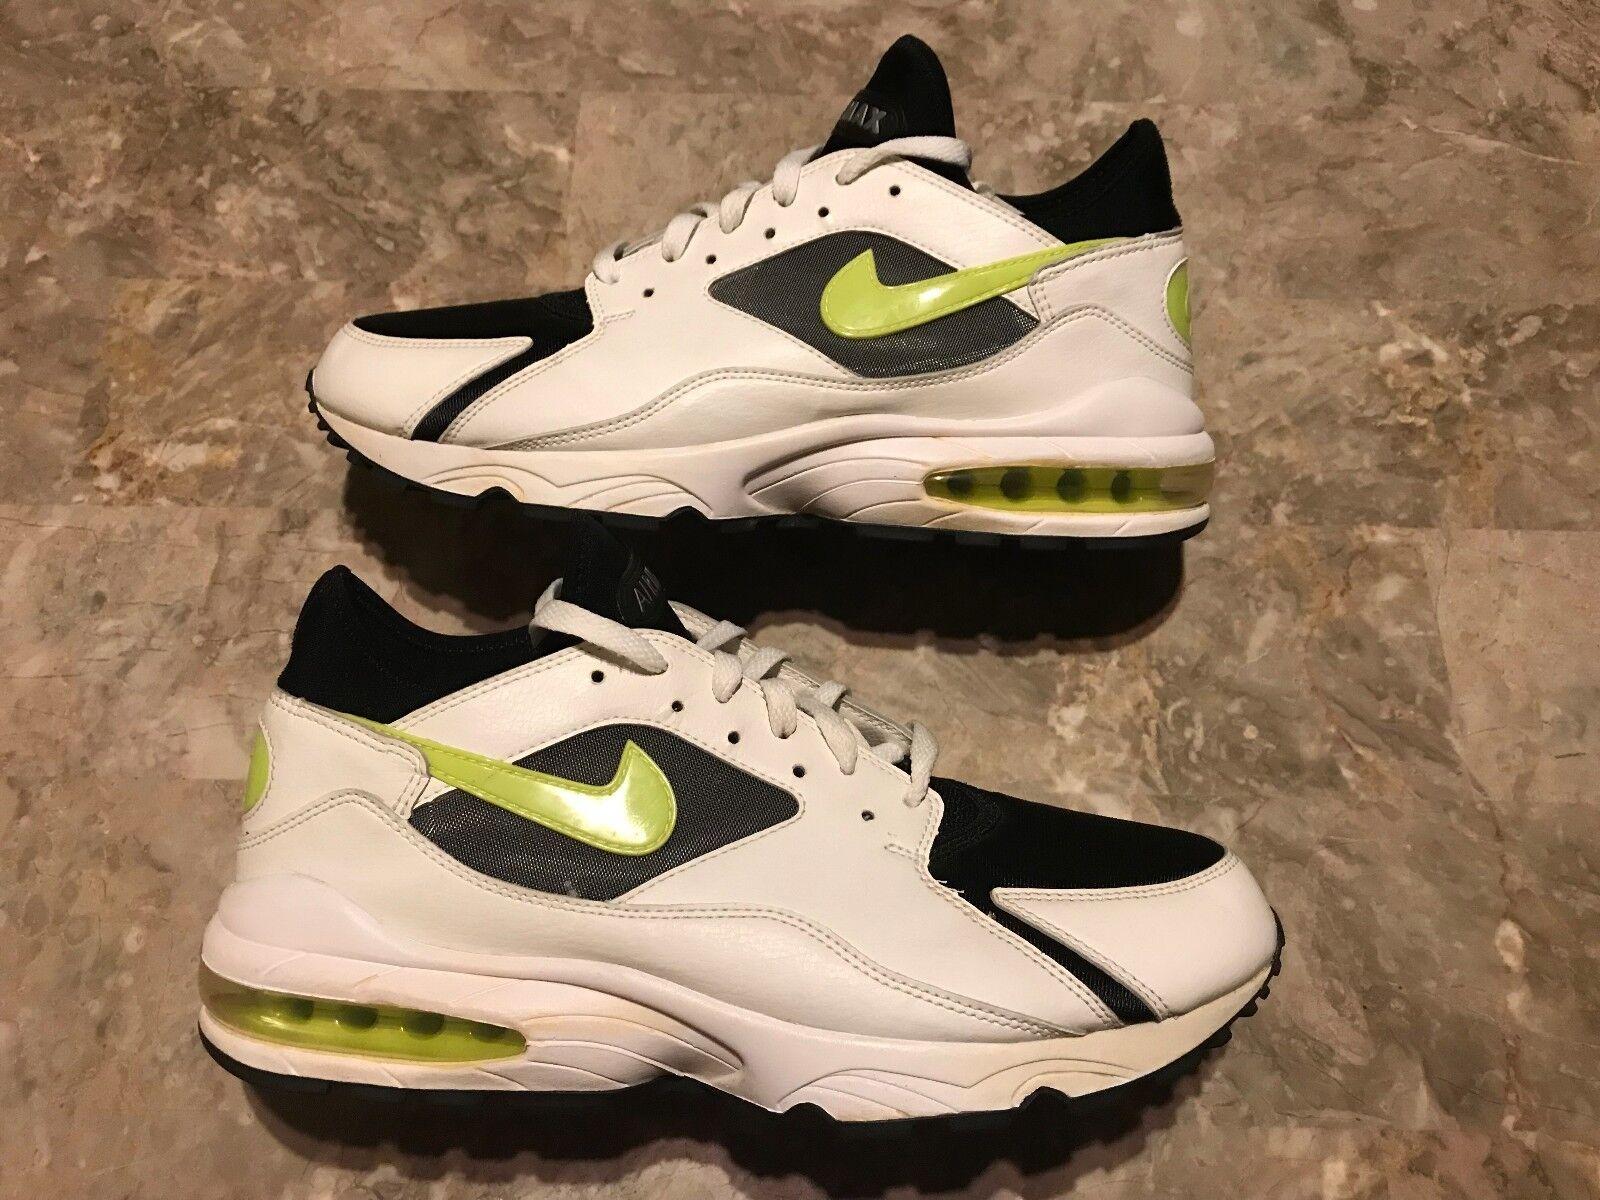 RARE 2006 Nike Air Max 93 AM93 History Of Air White Volt Size 10.5 (314288-991)